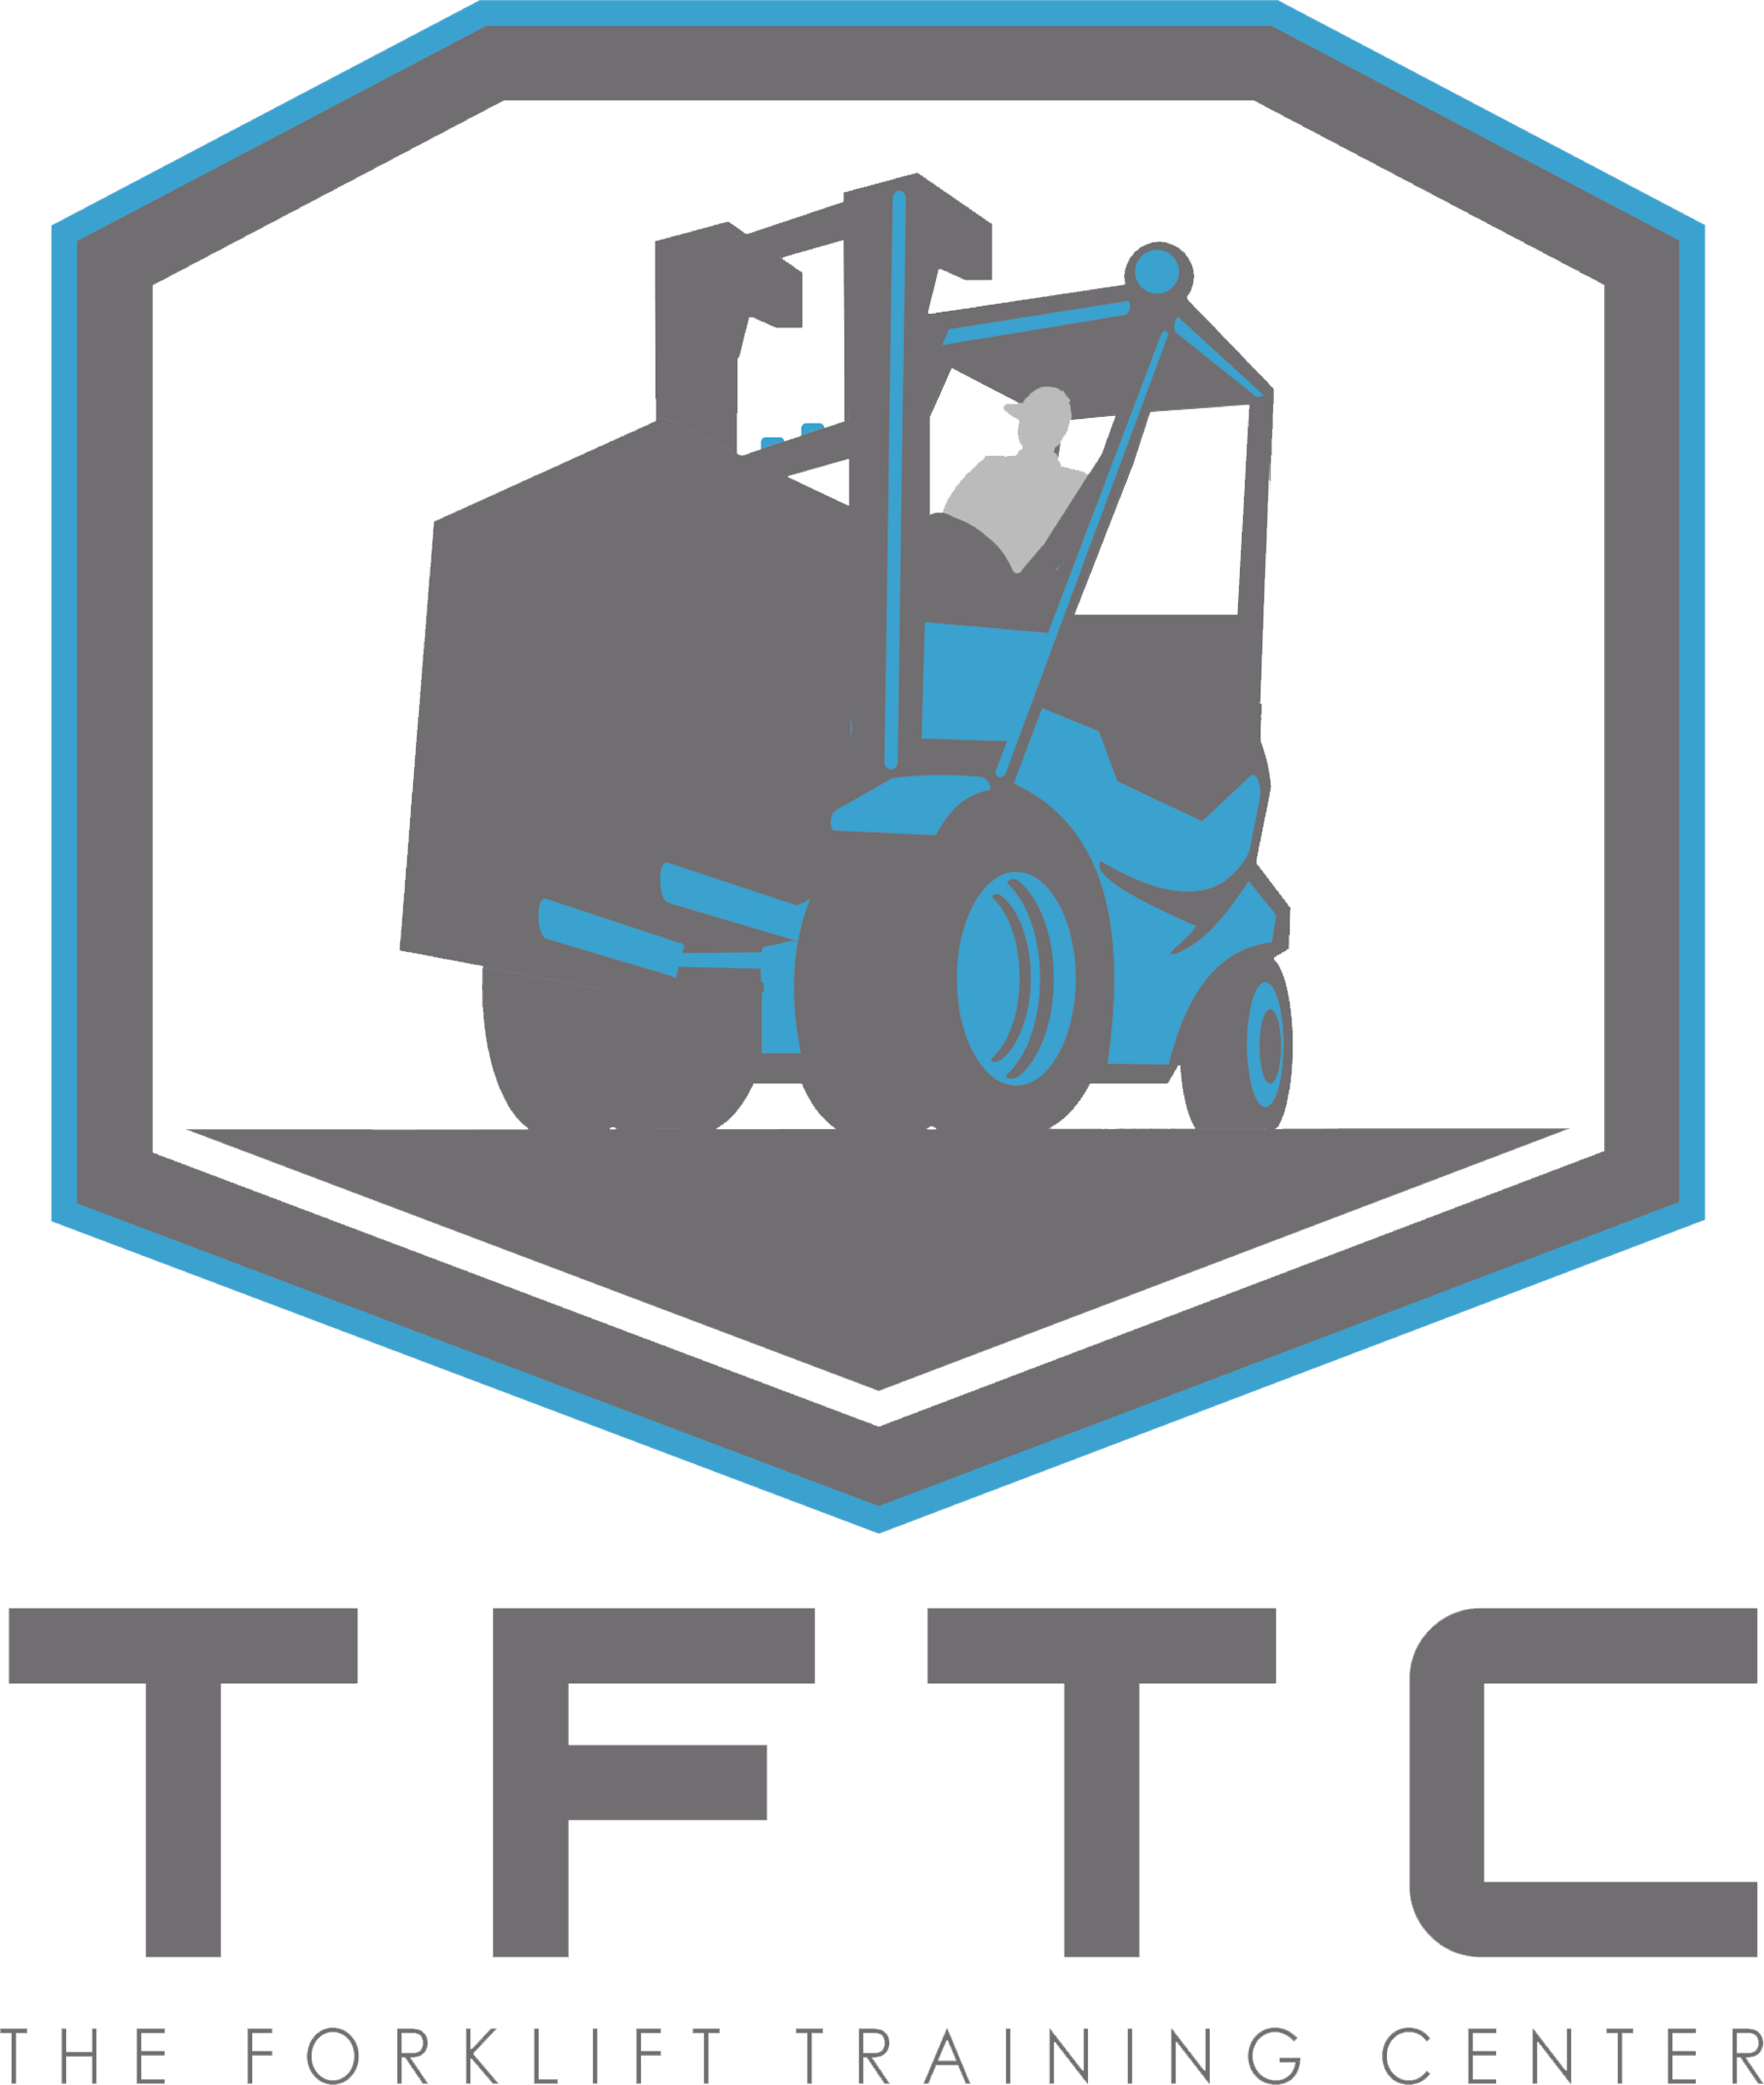 Forklift terminal tractor scissor. Driving clipart train operator